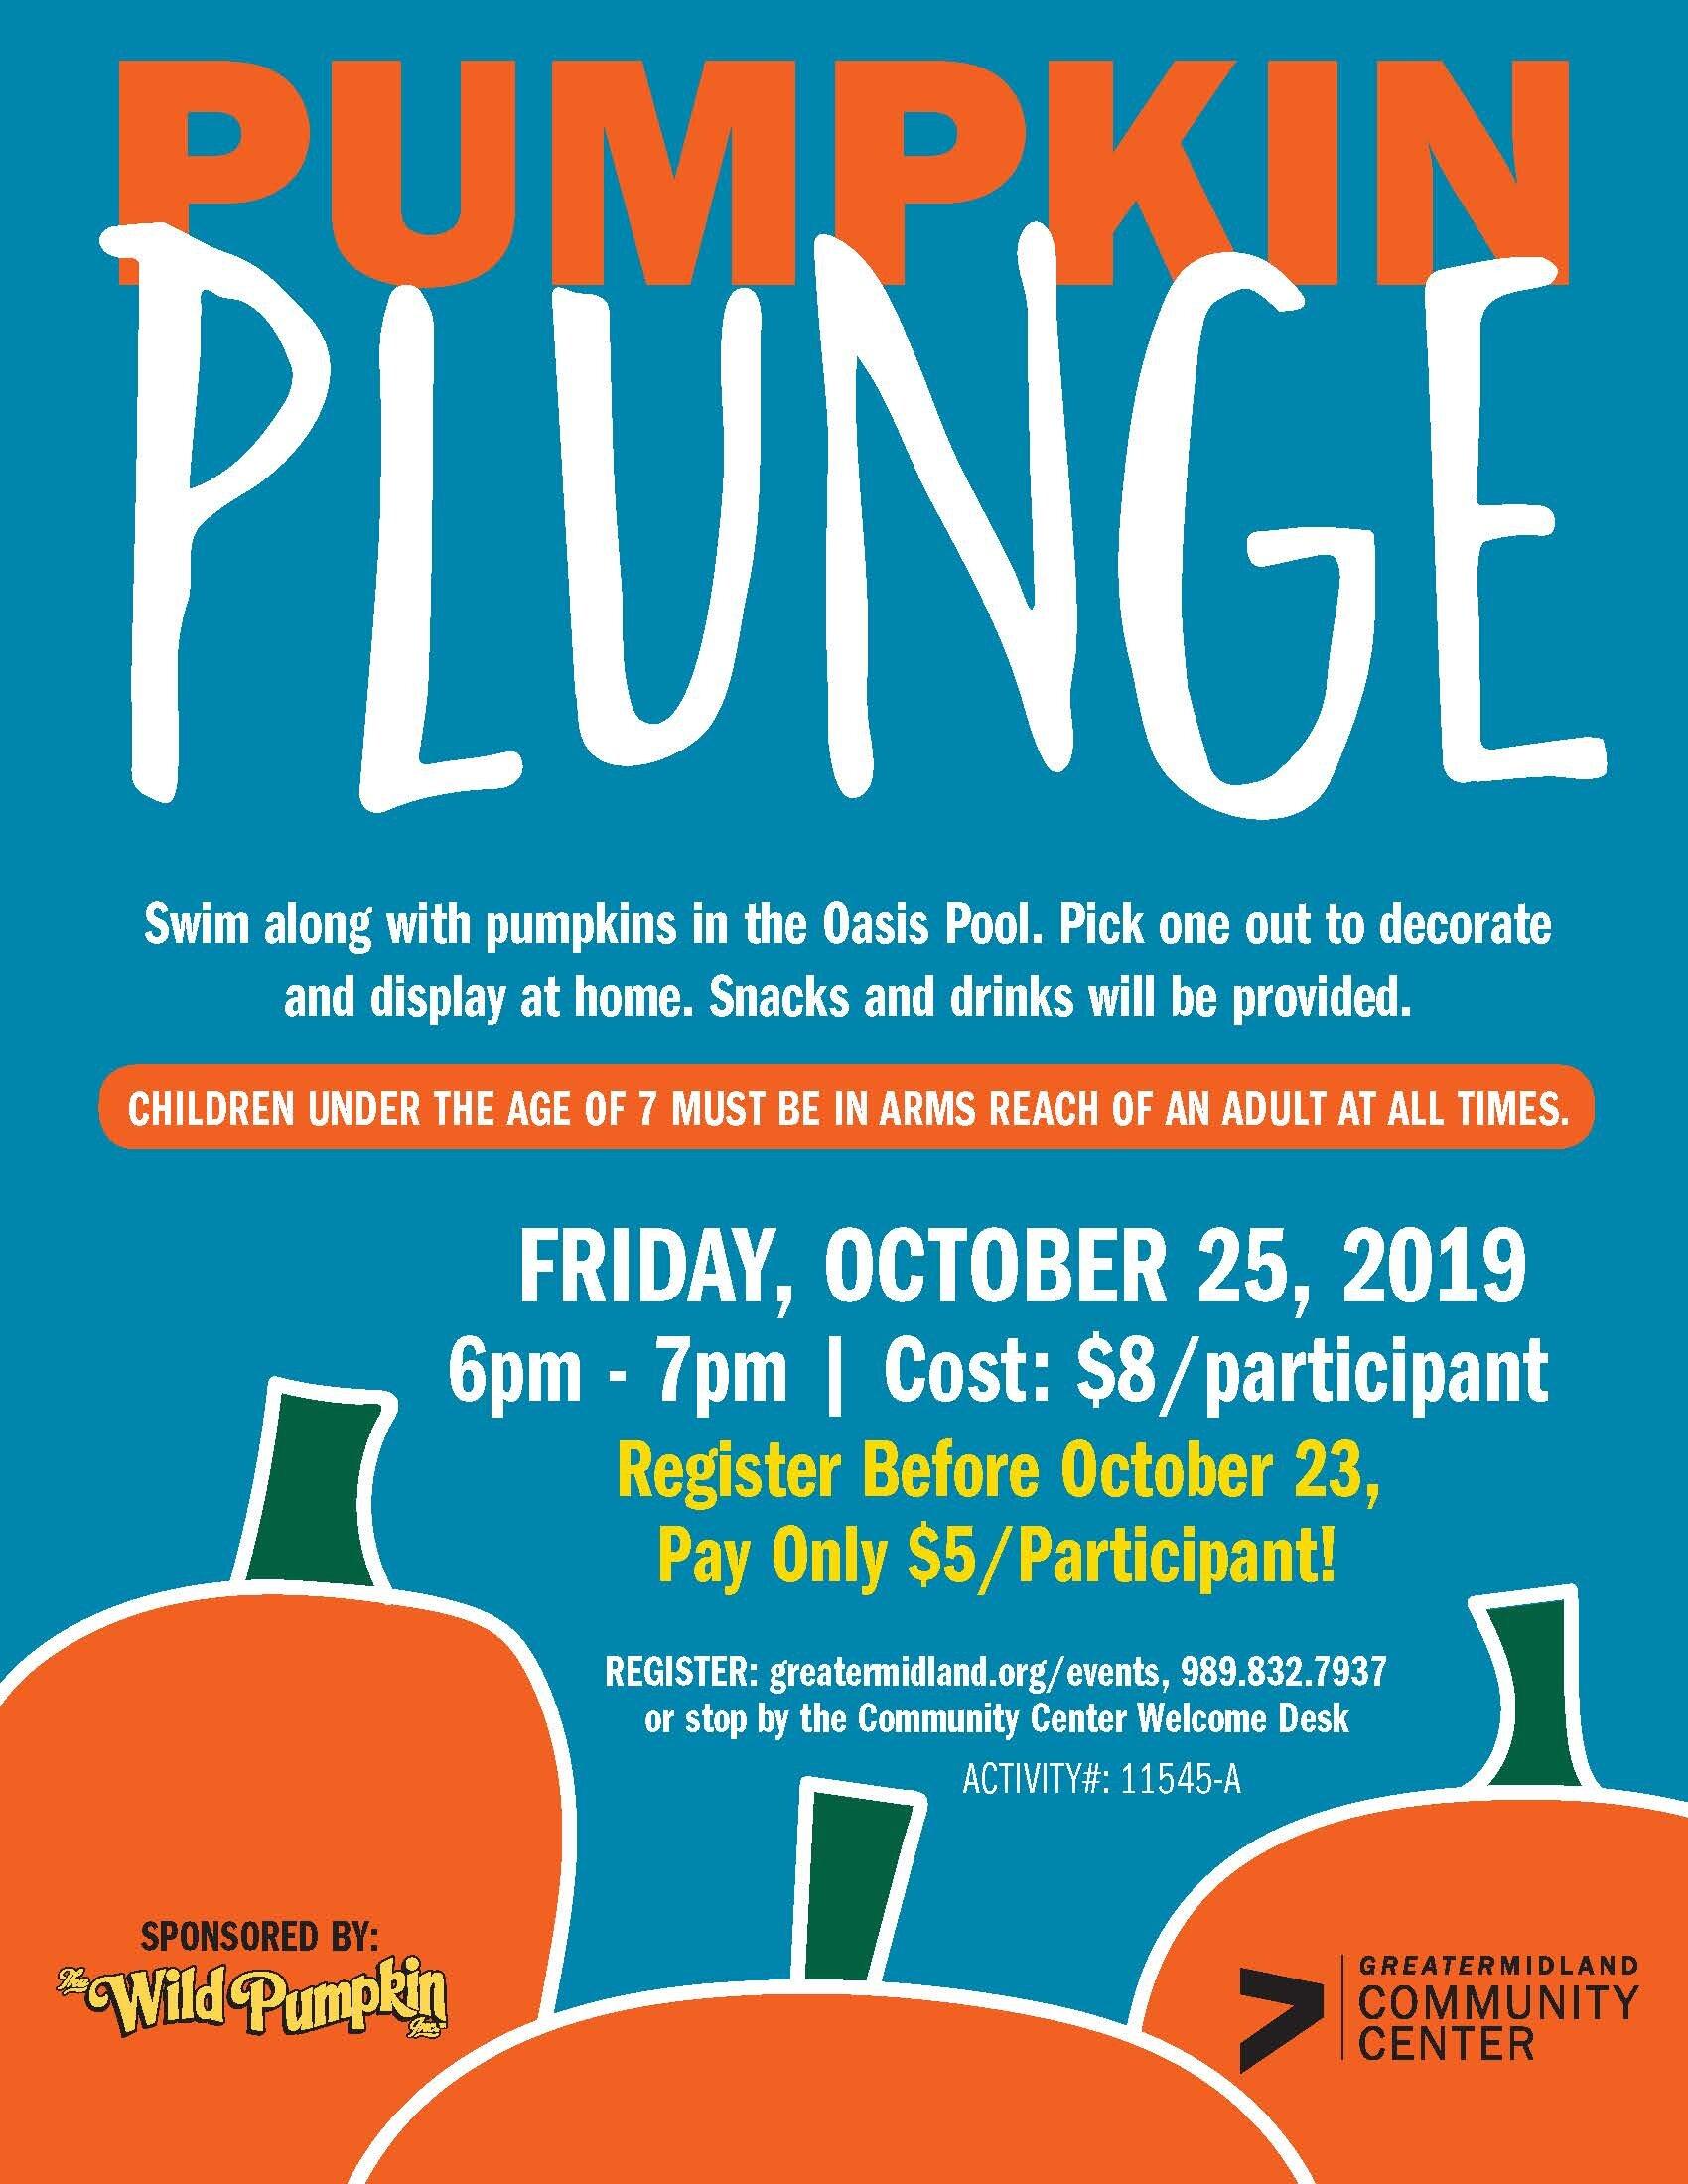 Pumpkin-Plunge-Fall-2019.jpg